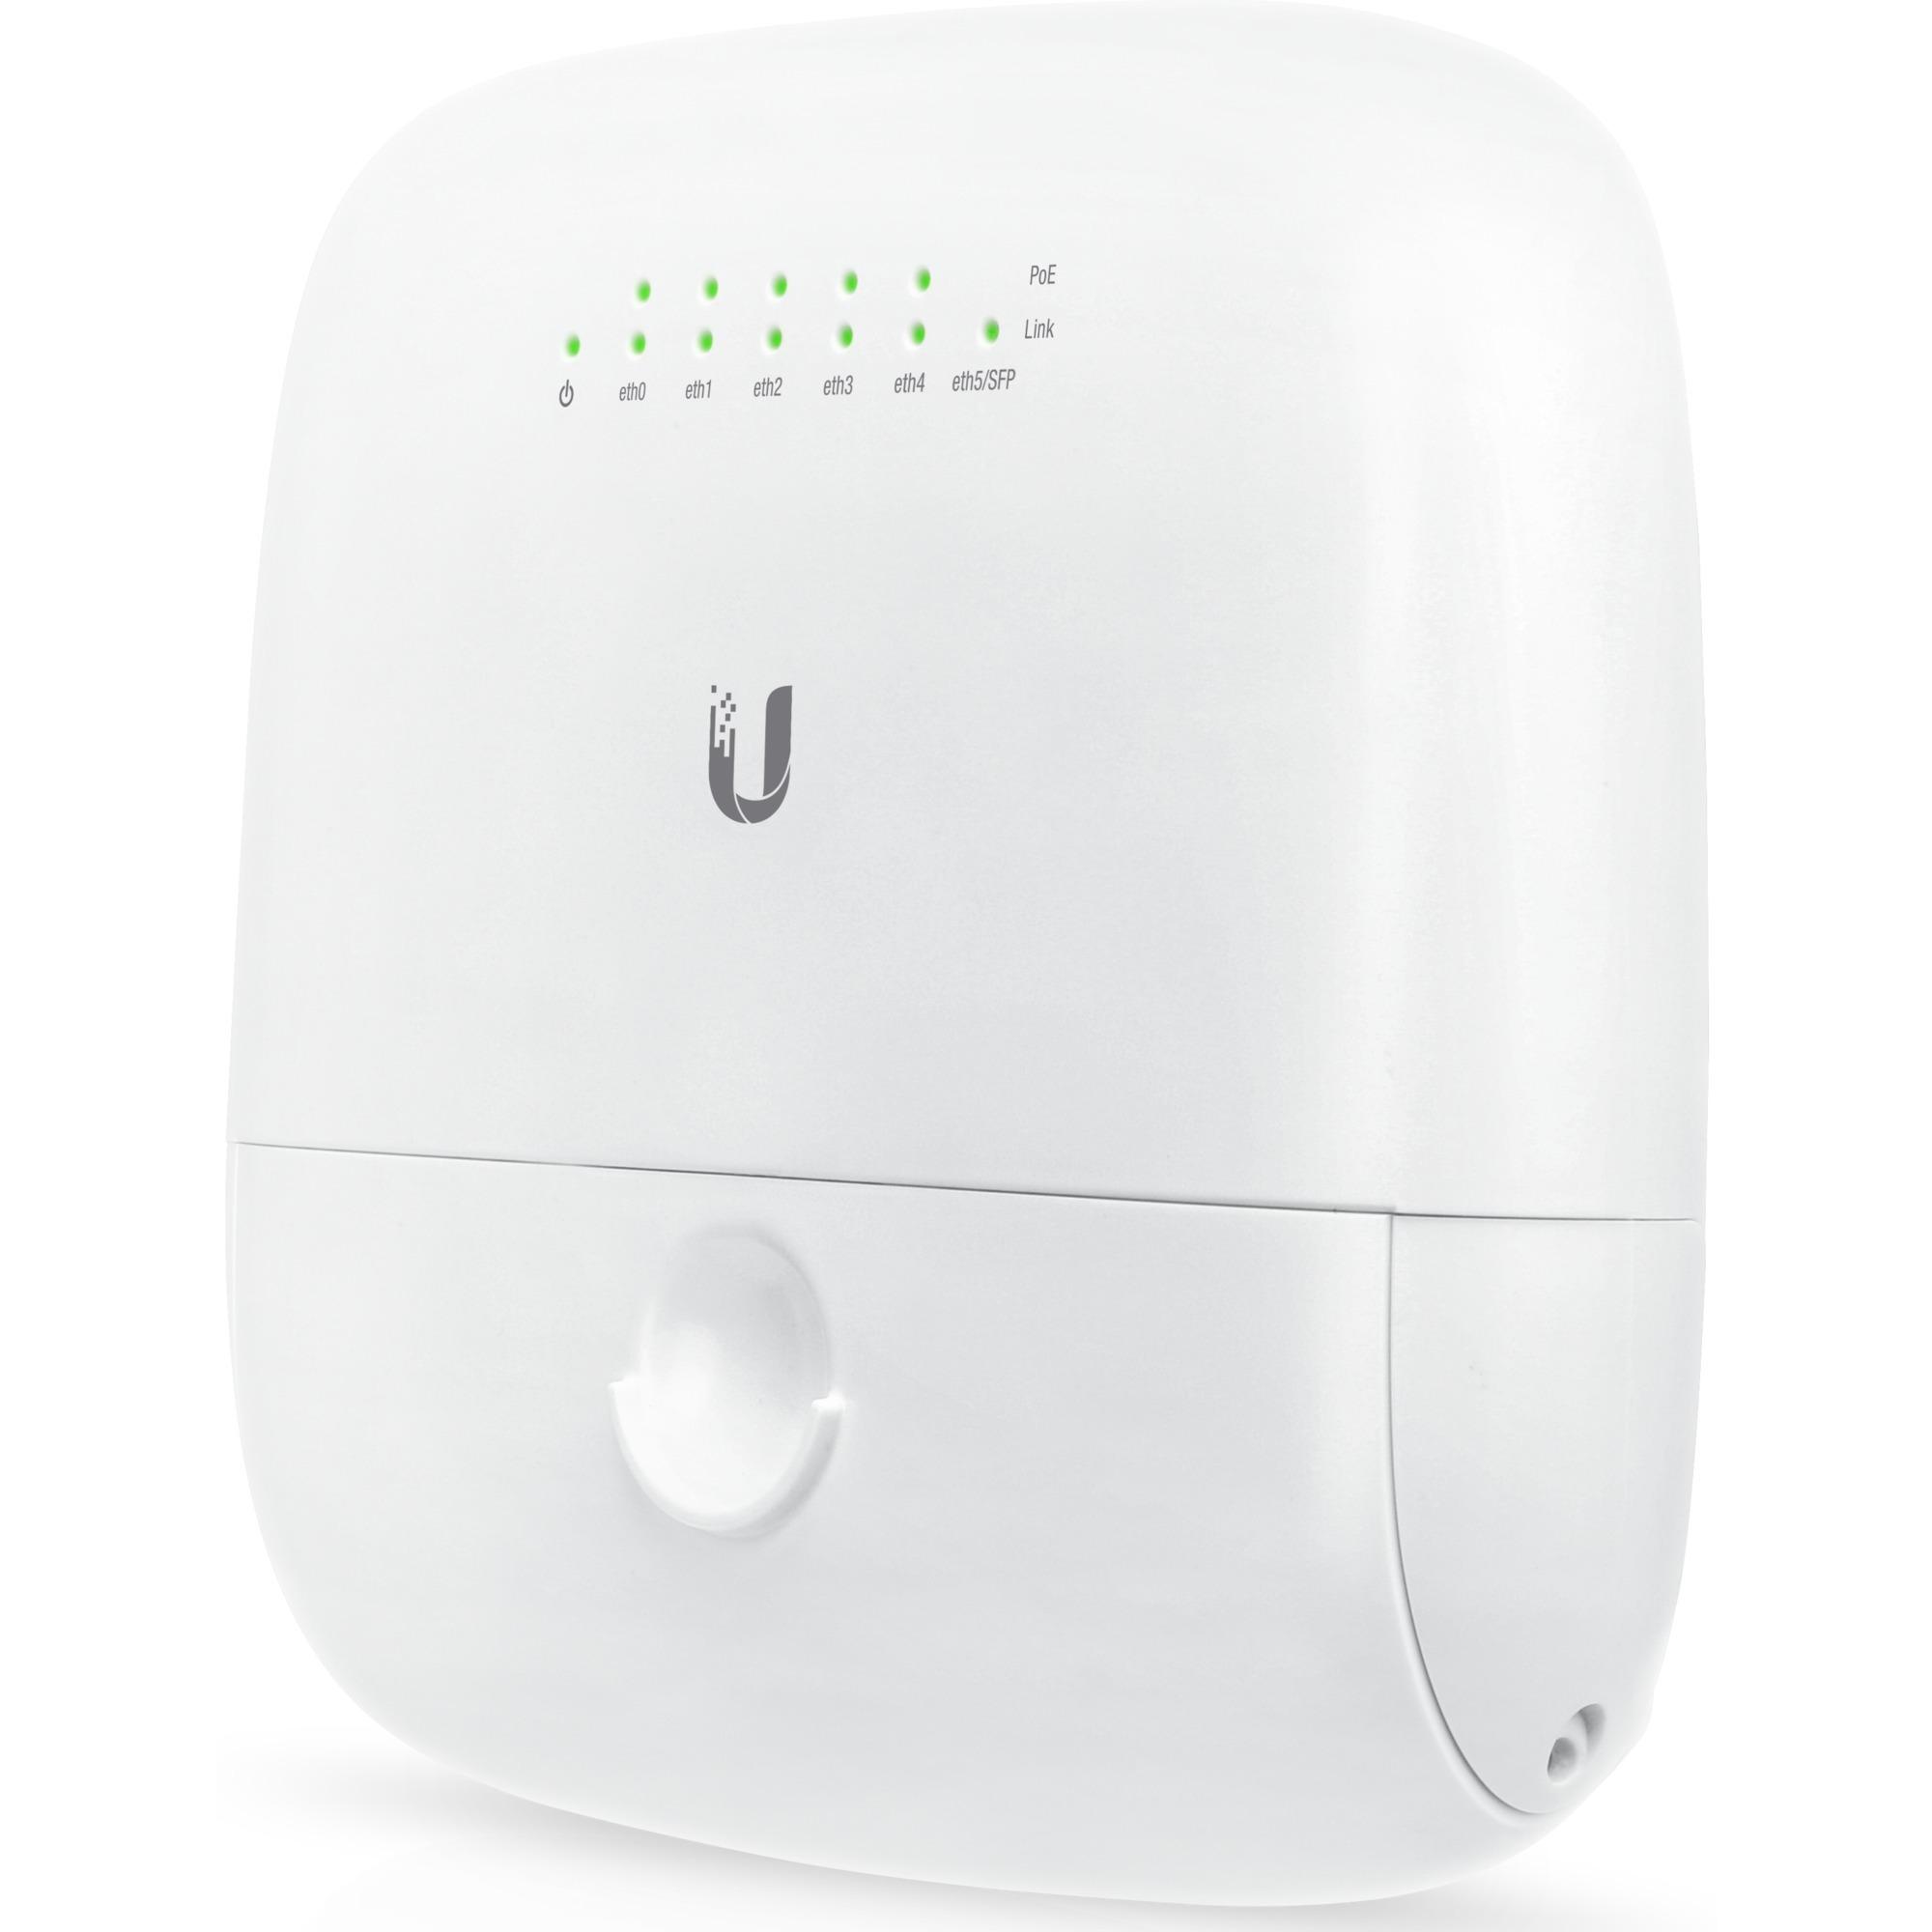 EP-R6 switch L3 Gigabit Ethernet (10/100/1000) Blanco Energía sobre Ethernet (PoE), Router